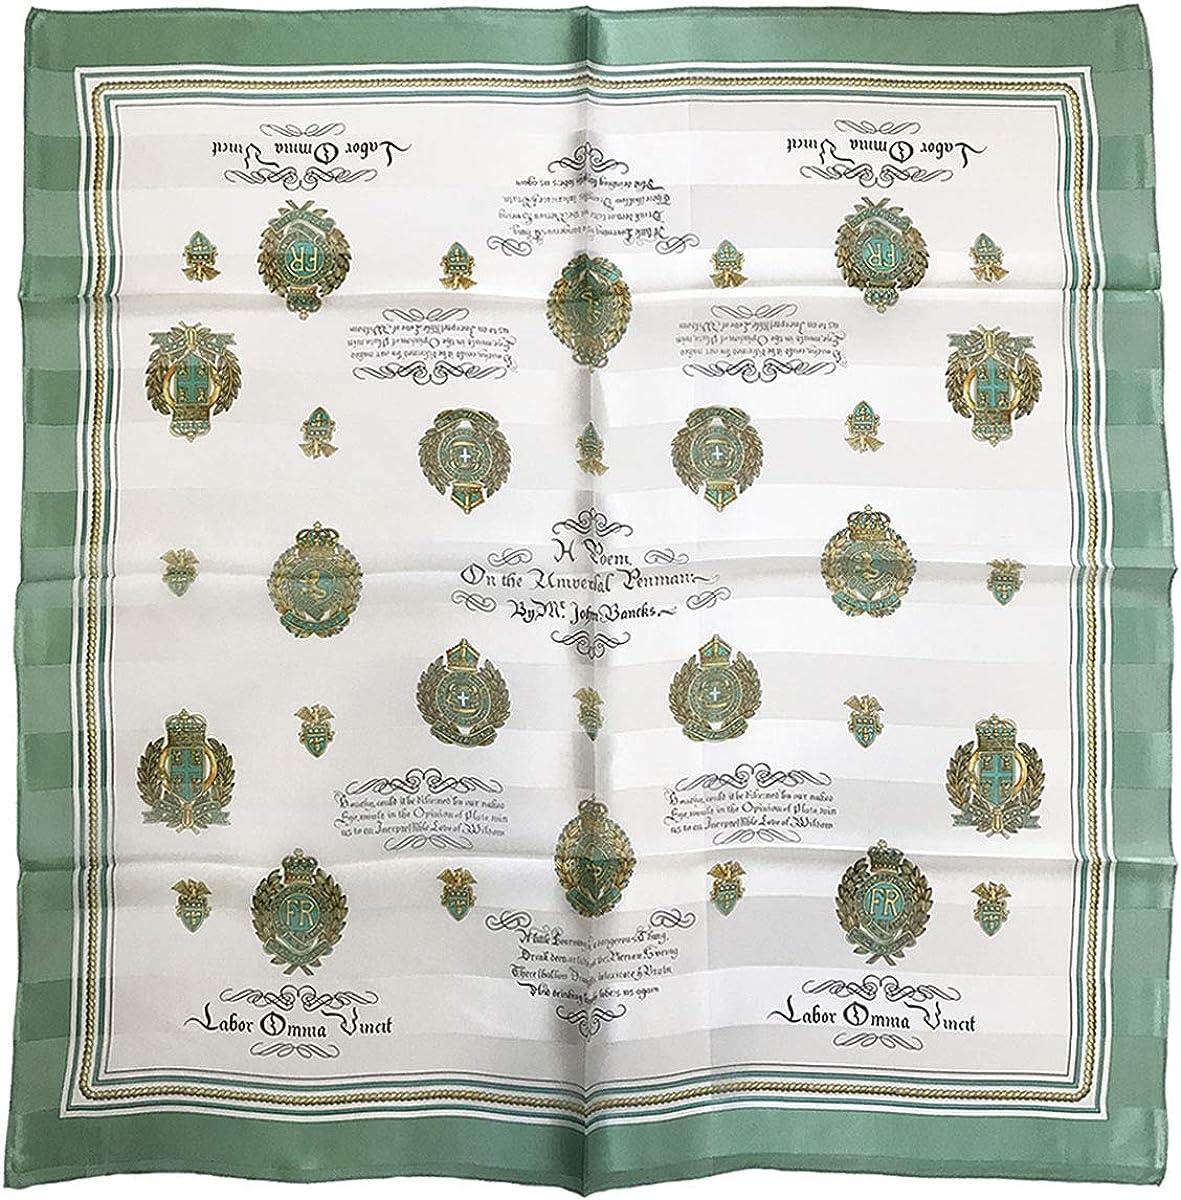 Silk Scarf, 9095 Letter emblem, precision printed, lightairy satin, Brand Cased, SS889095